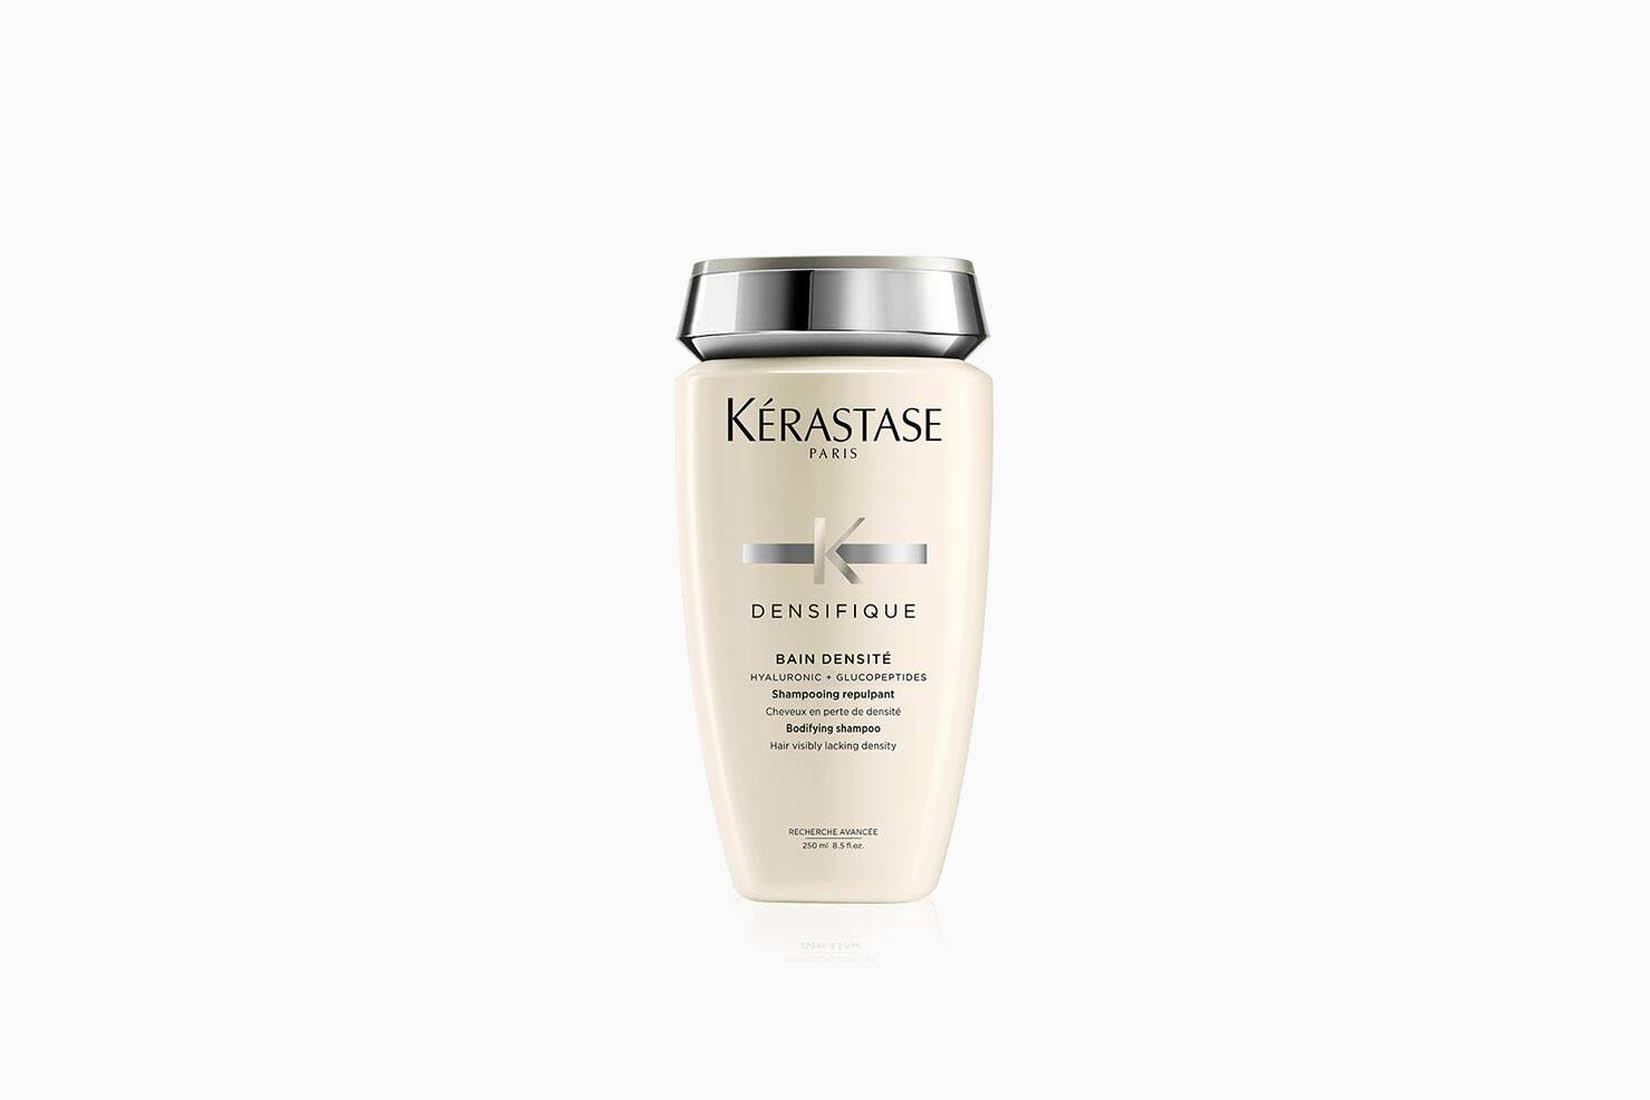 Best Hair Loss Shampoo Men Kerastase Review - Luxe Digital